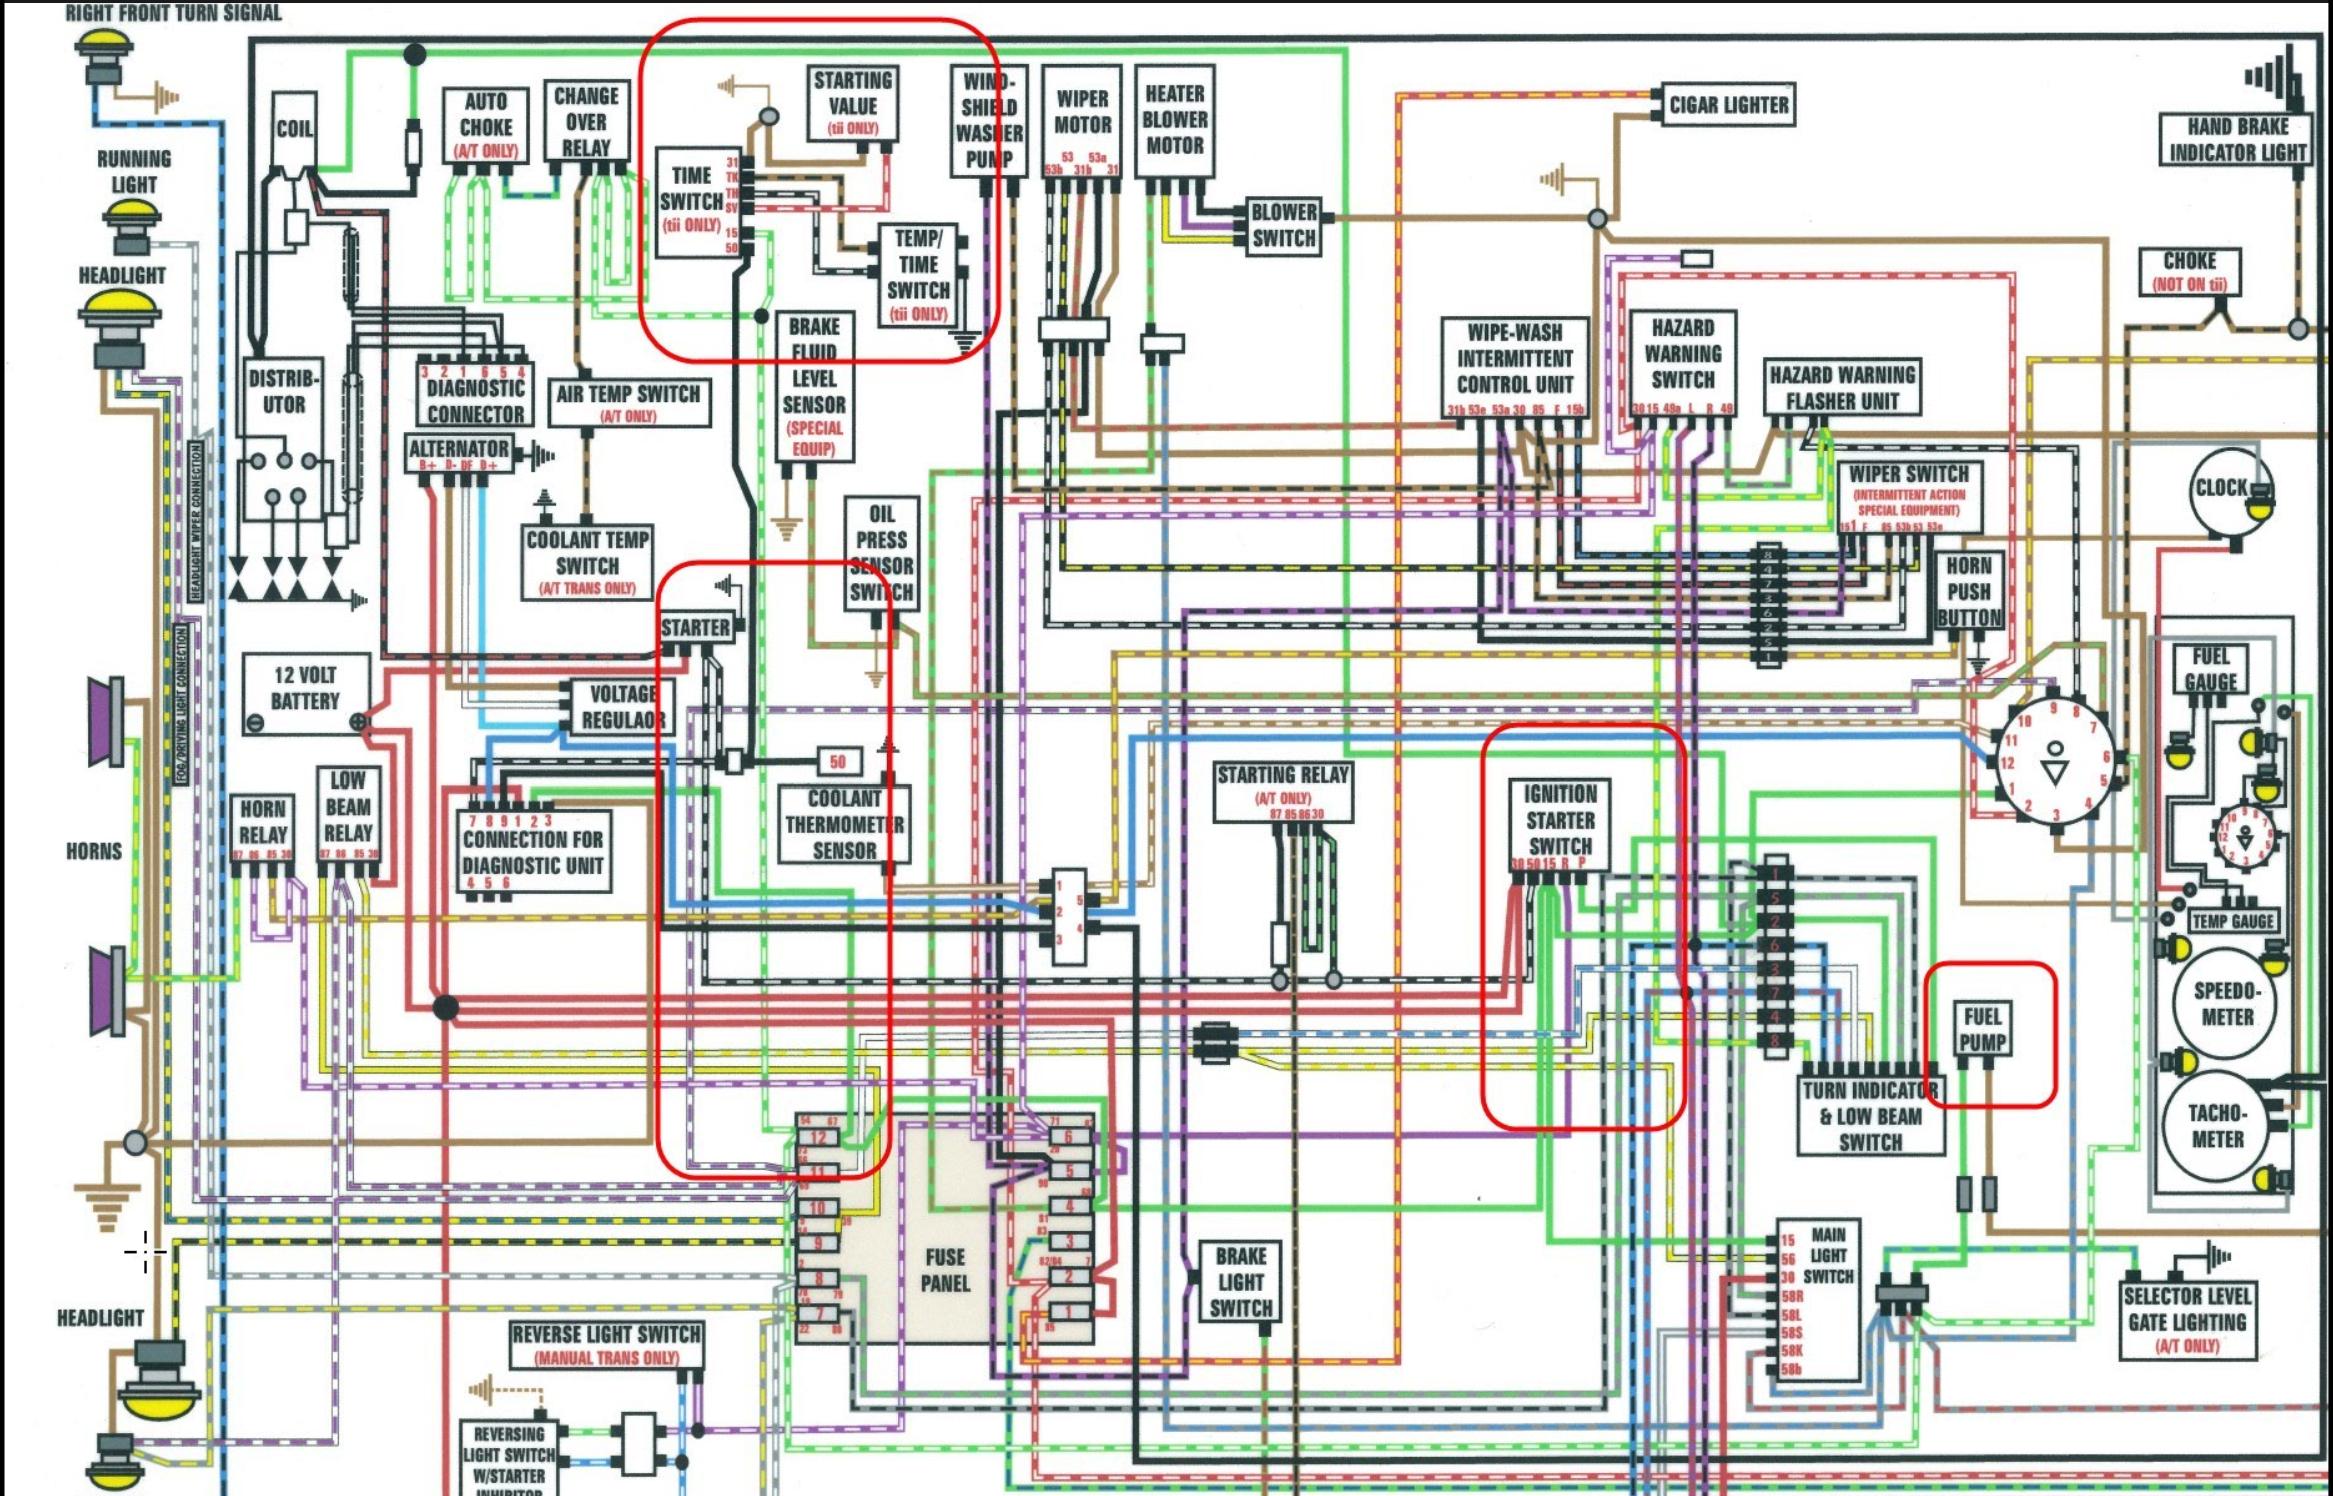 Tii Cold Start System Troubleshooting Help Bmw 2002 General Wiring Diagram Imagethumb957f39b1f340ef2802c158505612160e